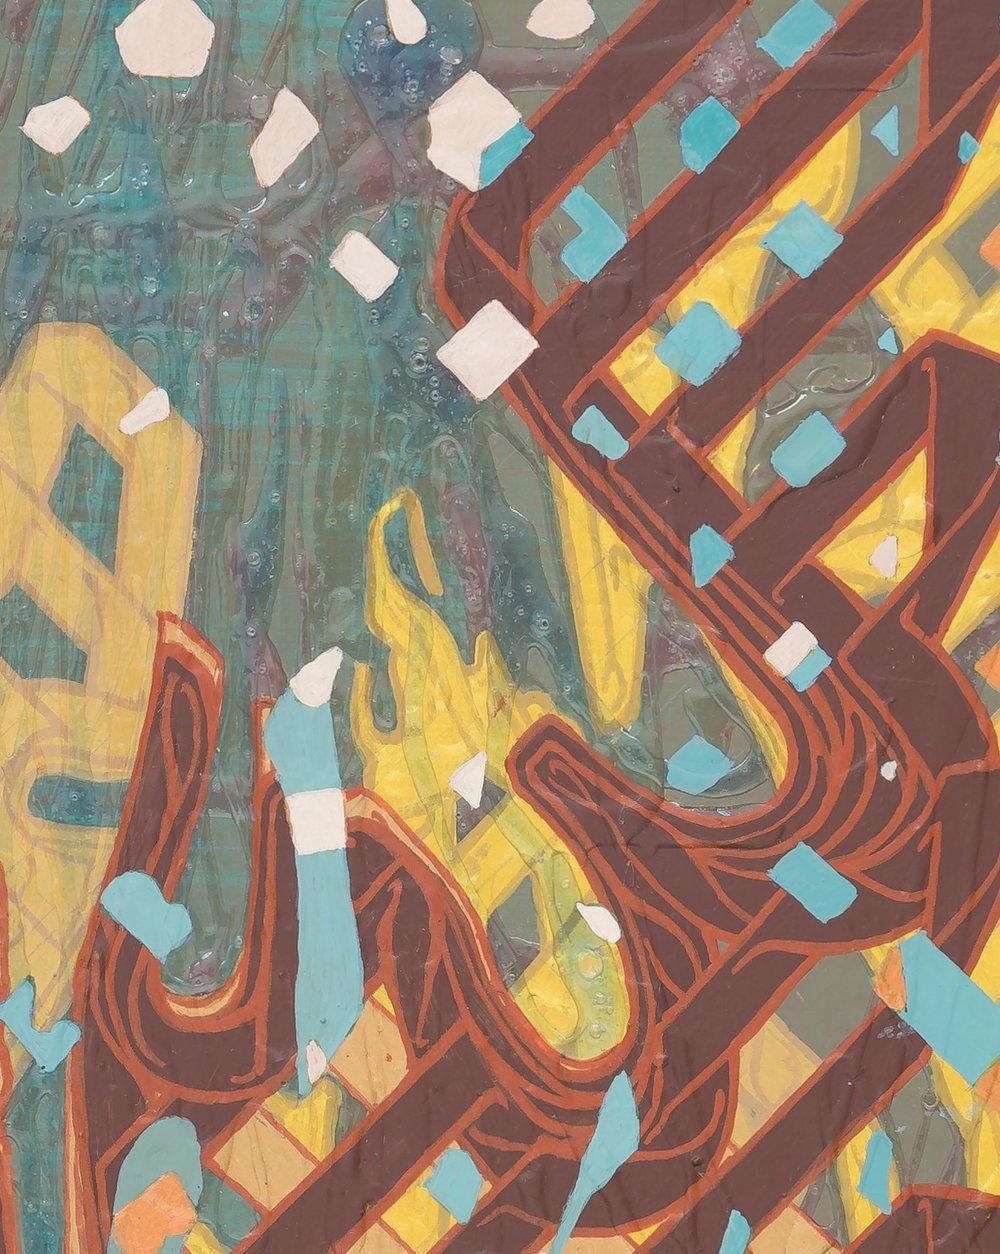 JSUN8183 detail.jpg